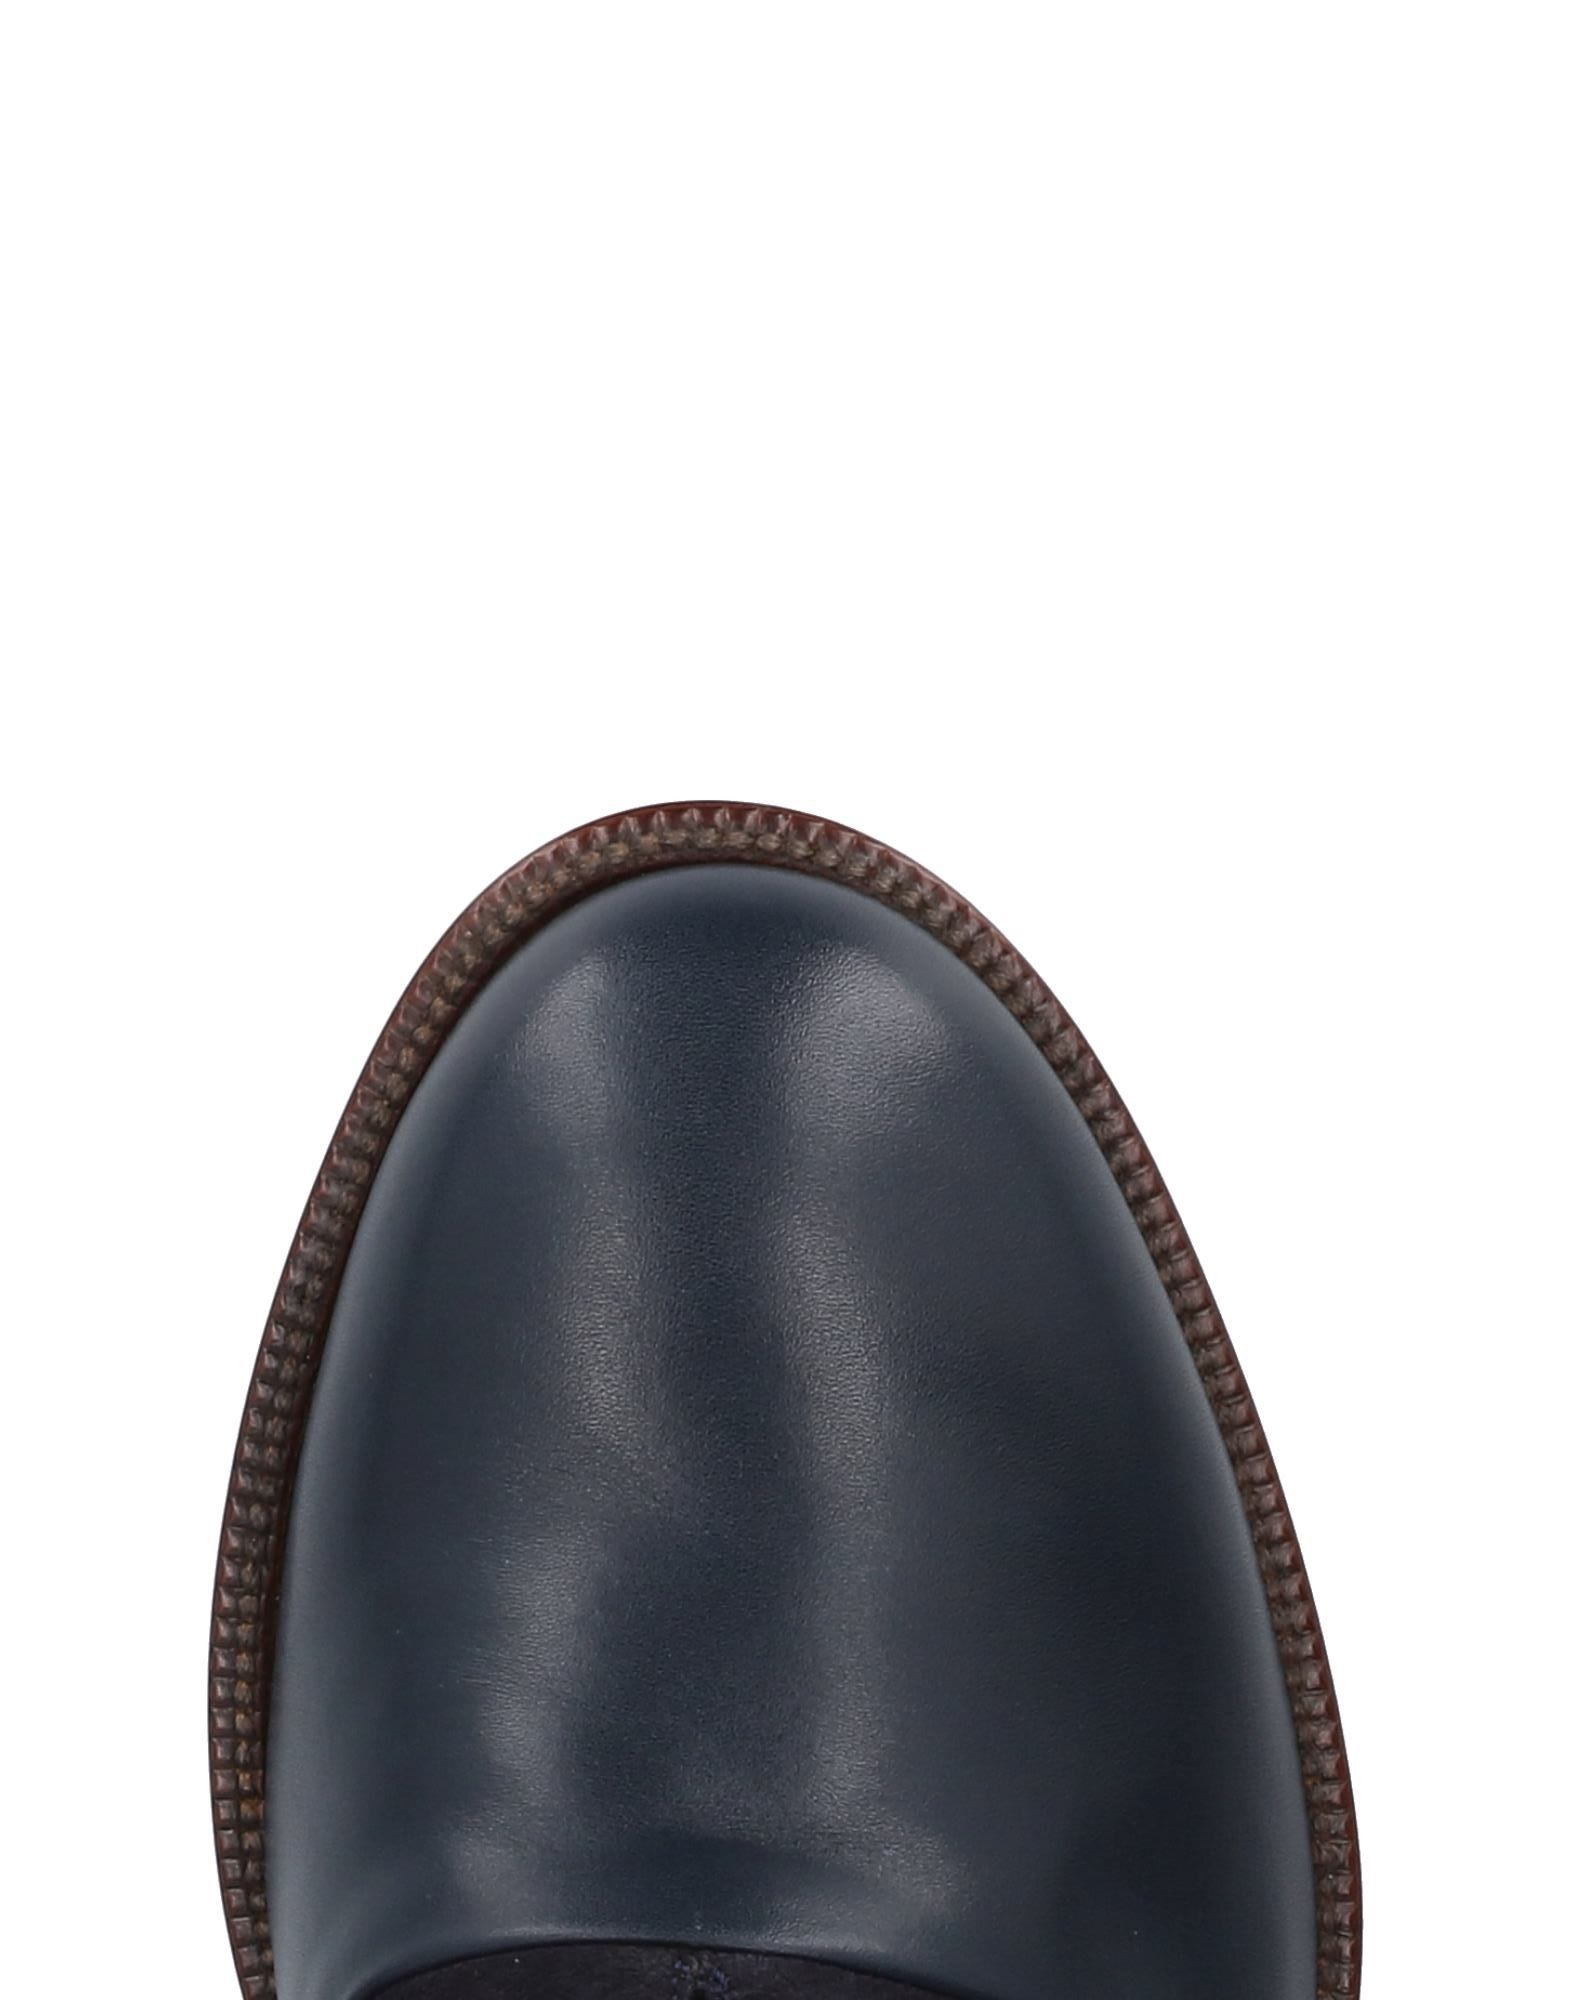 A.Testoni Gute Schnürschuhe Herren  11459100AS Gute A.Testoni Qualität beliebte Schuhe f62f2c